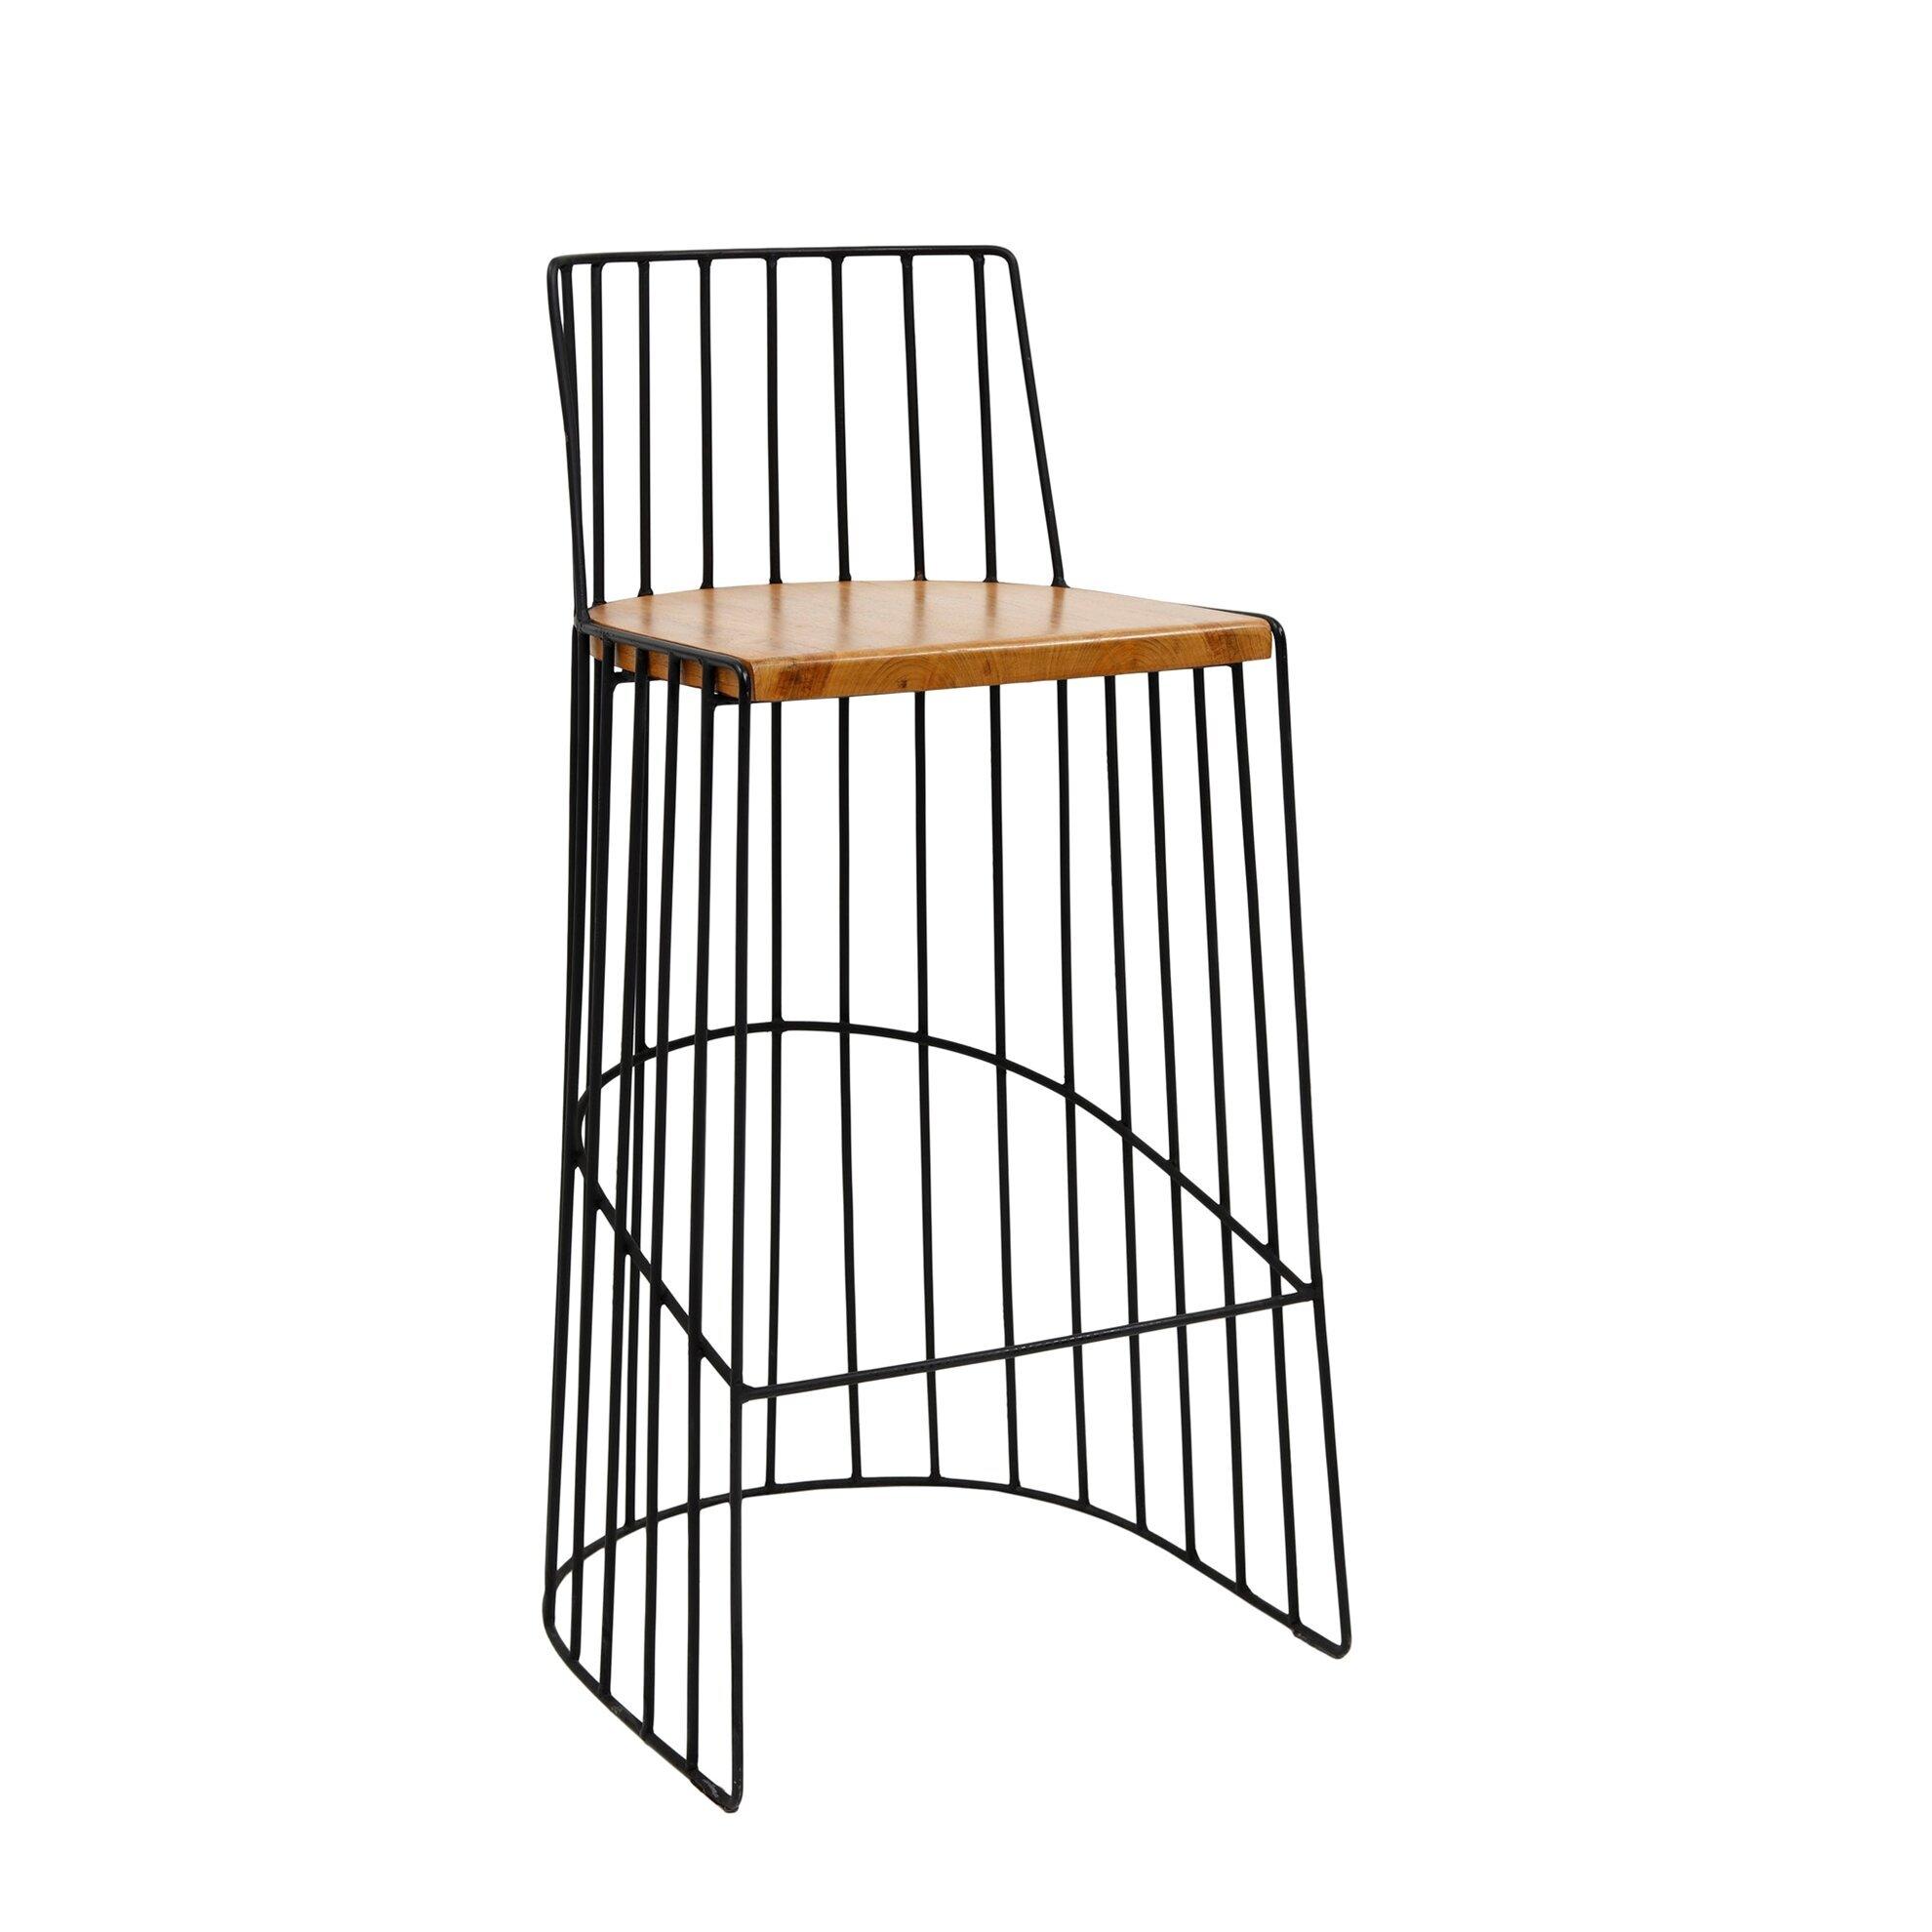 Tik Yüksek Sandalye (50x45x100cm)